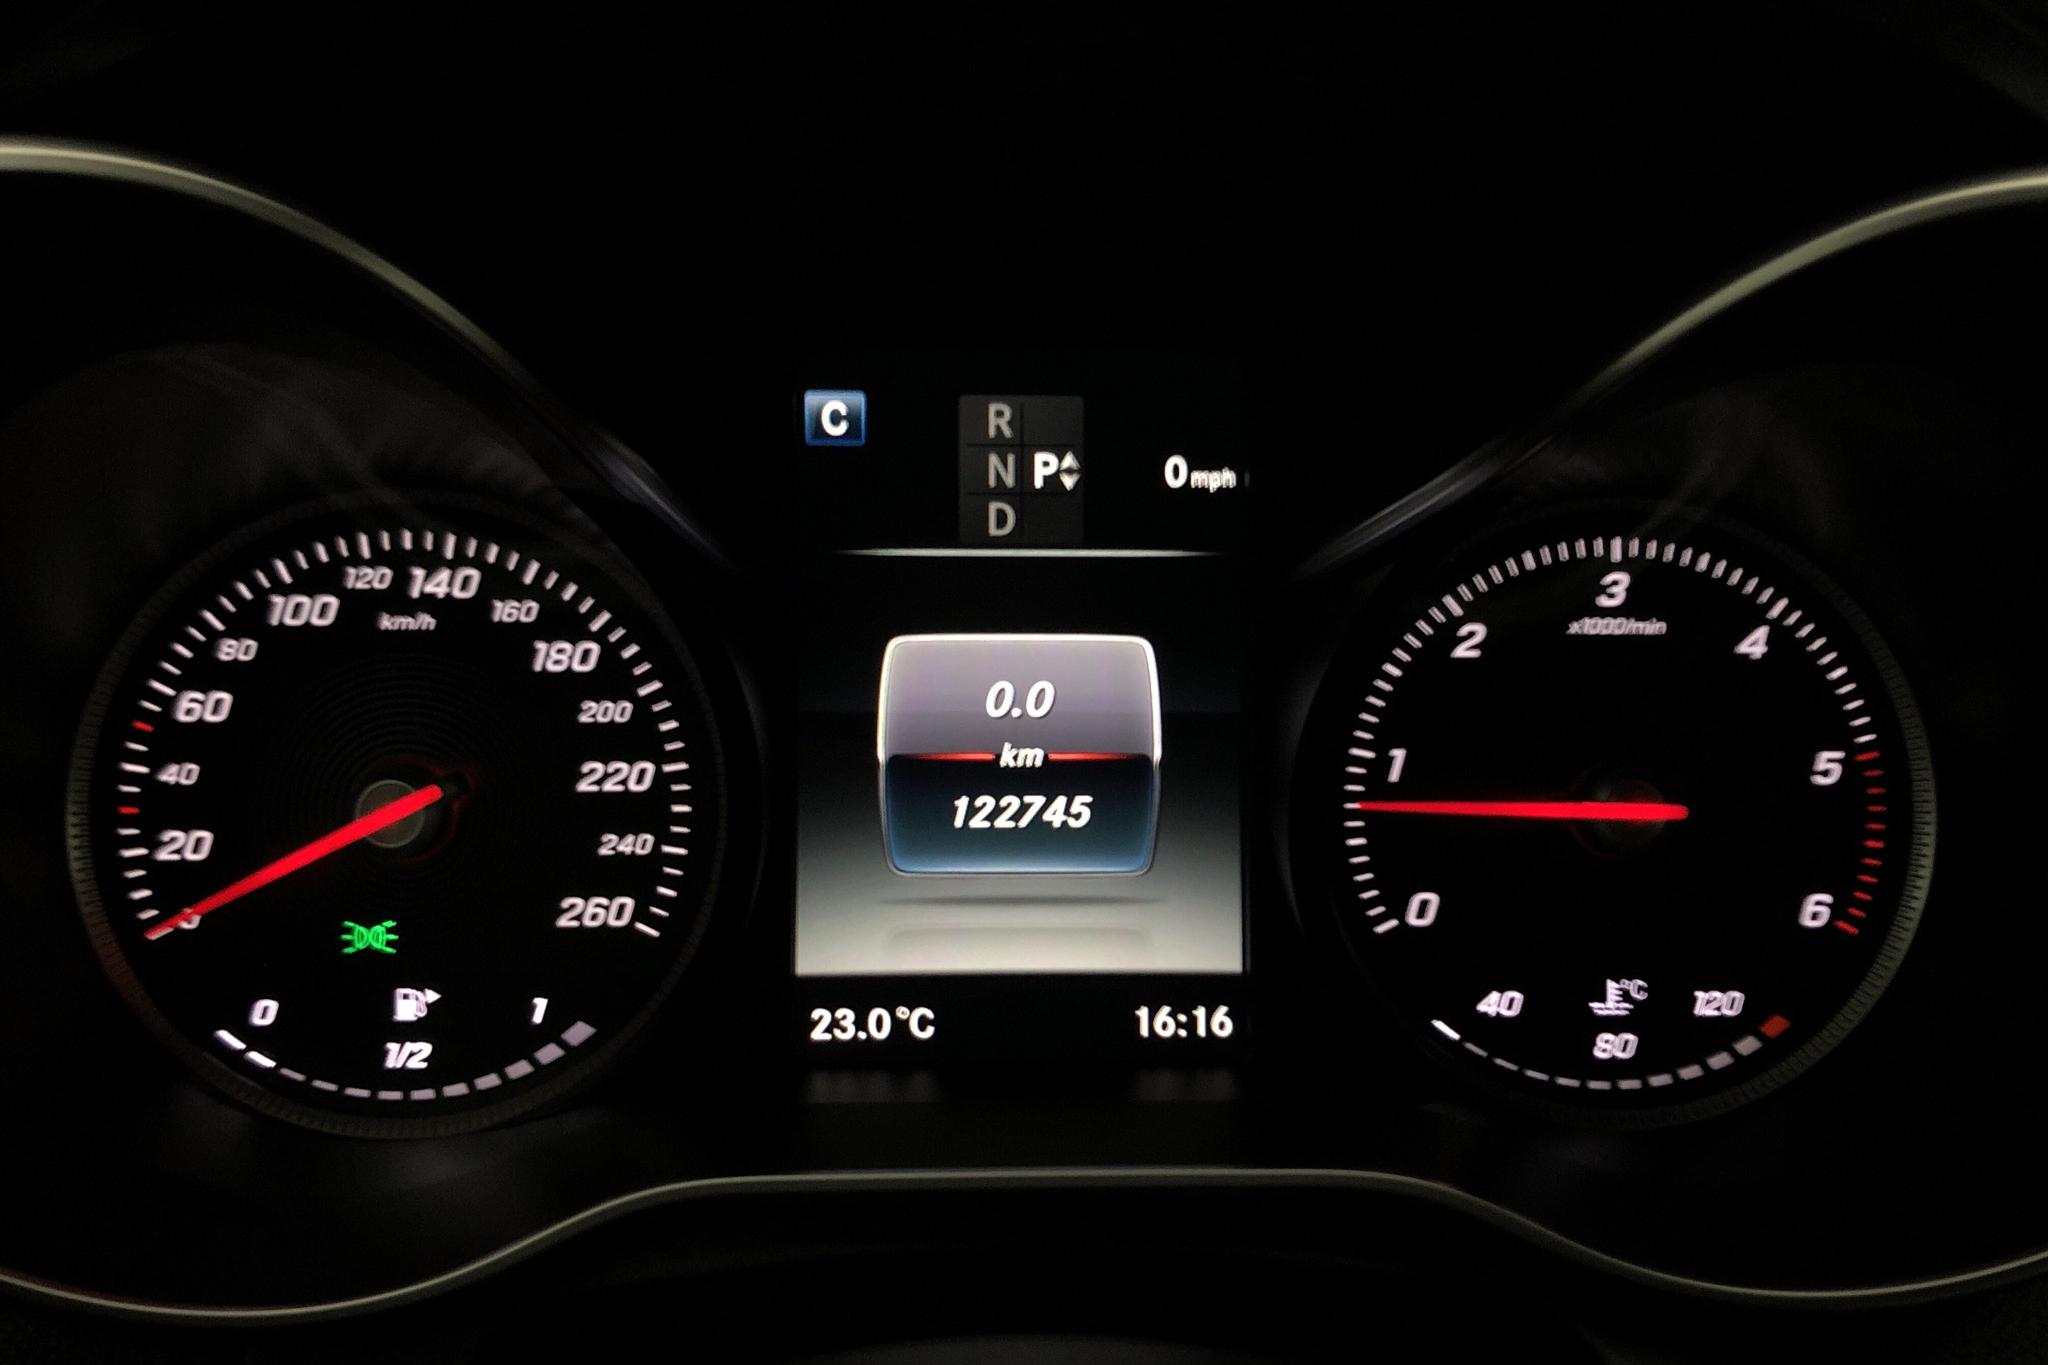 Mercedes C 220 d Kombi S205 (170hk) - 12 275 mil - Automat - vit - 2016